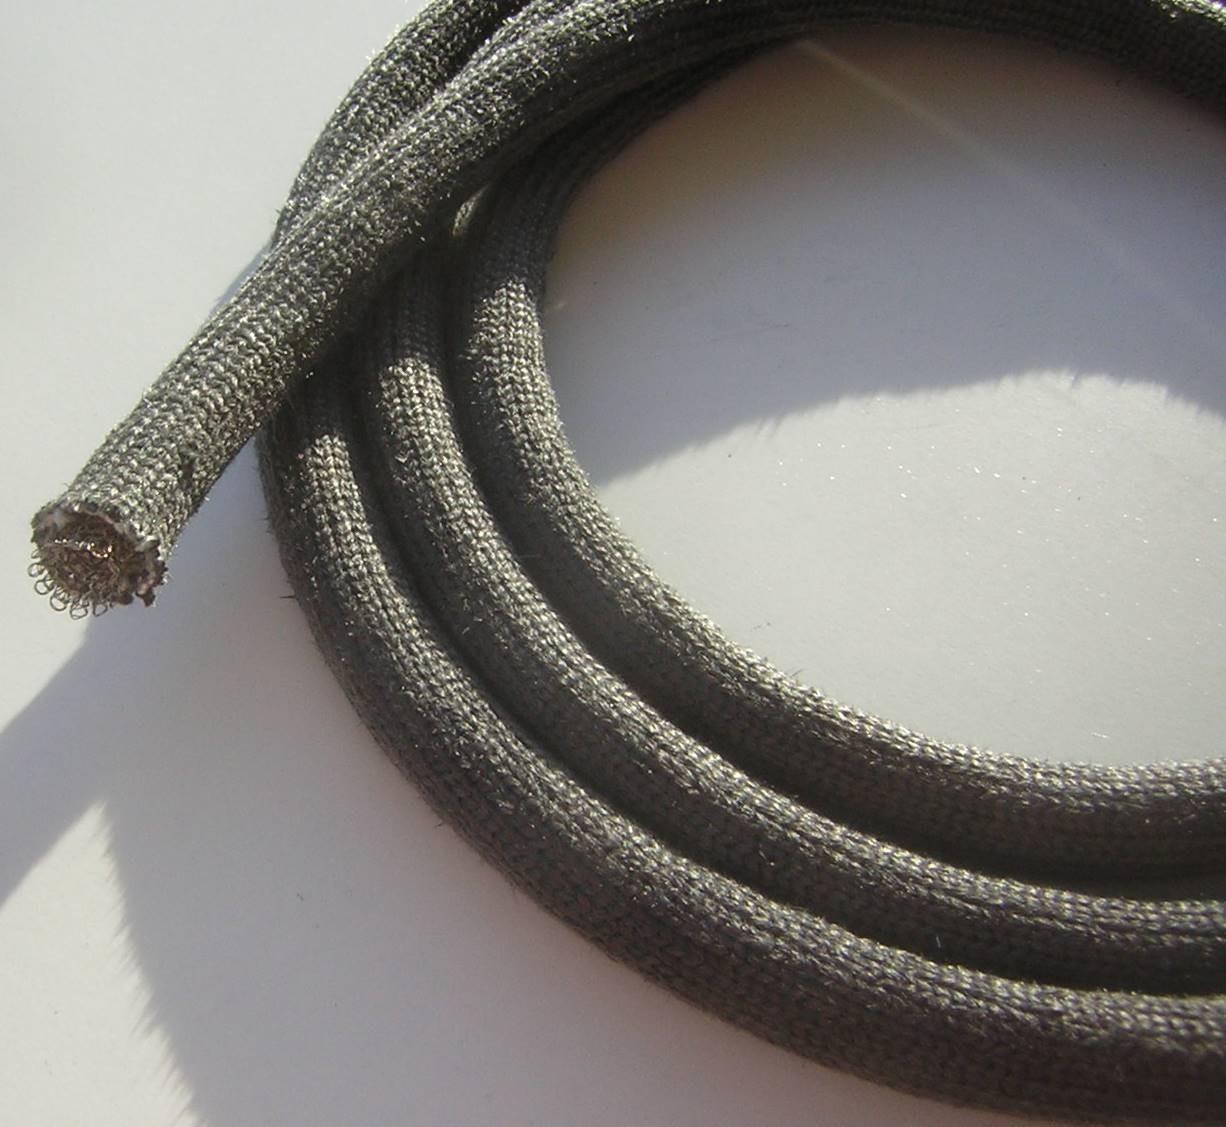 11mm Schlauchdichtung aus Silikatfasern, Drahtgeflecht innen, Hohldichtung Ofendichtung